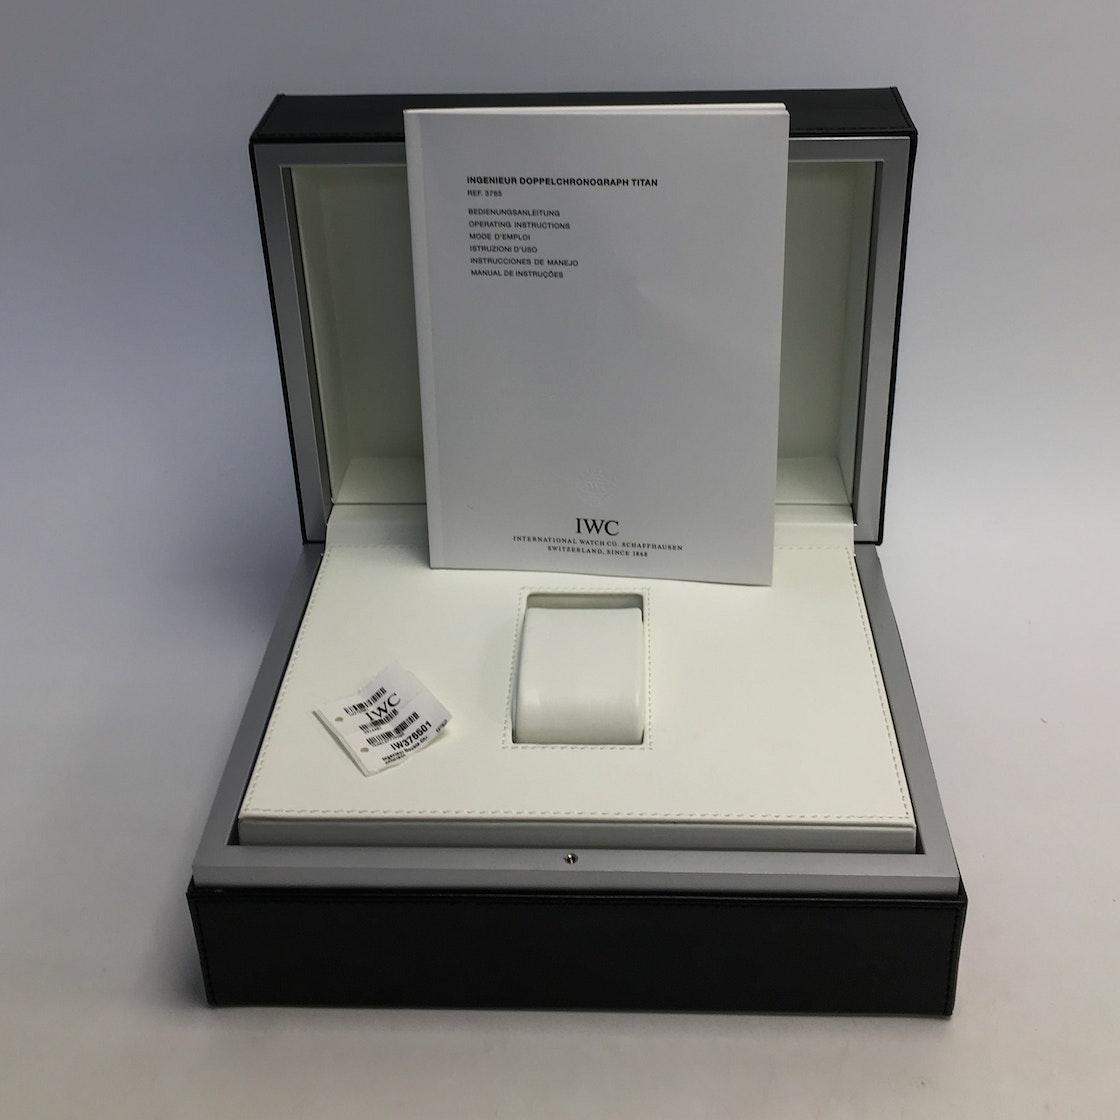 IWC Ingenieur Double Chronograph IW3765-01